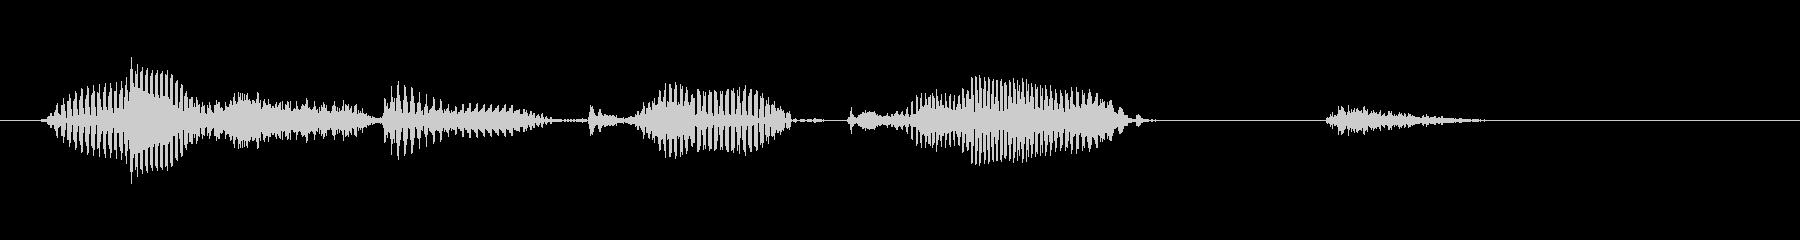 MissionCompleteの未再生の波形